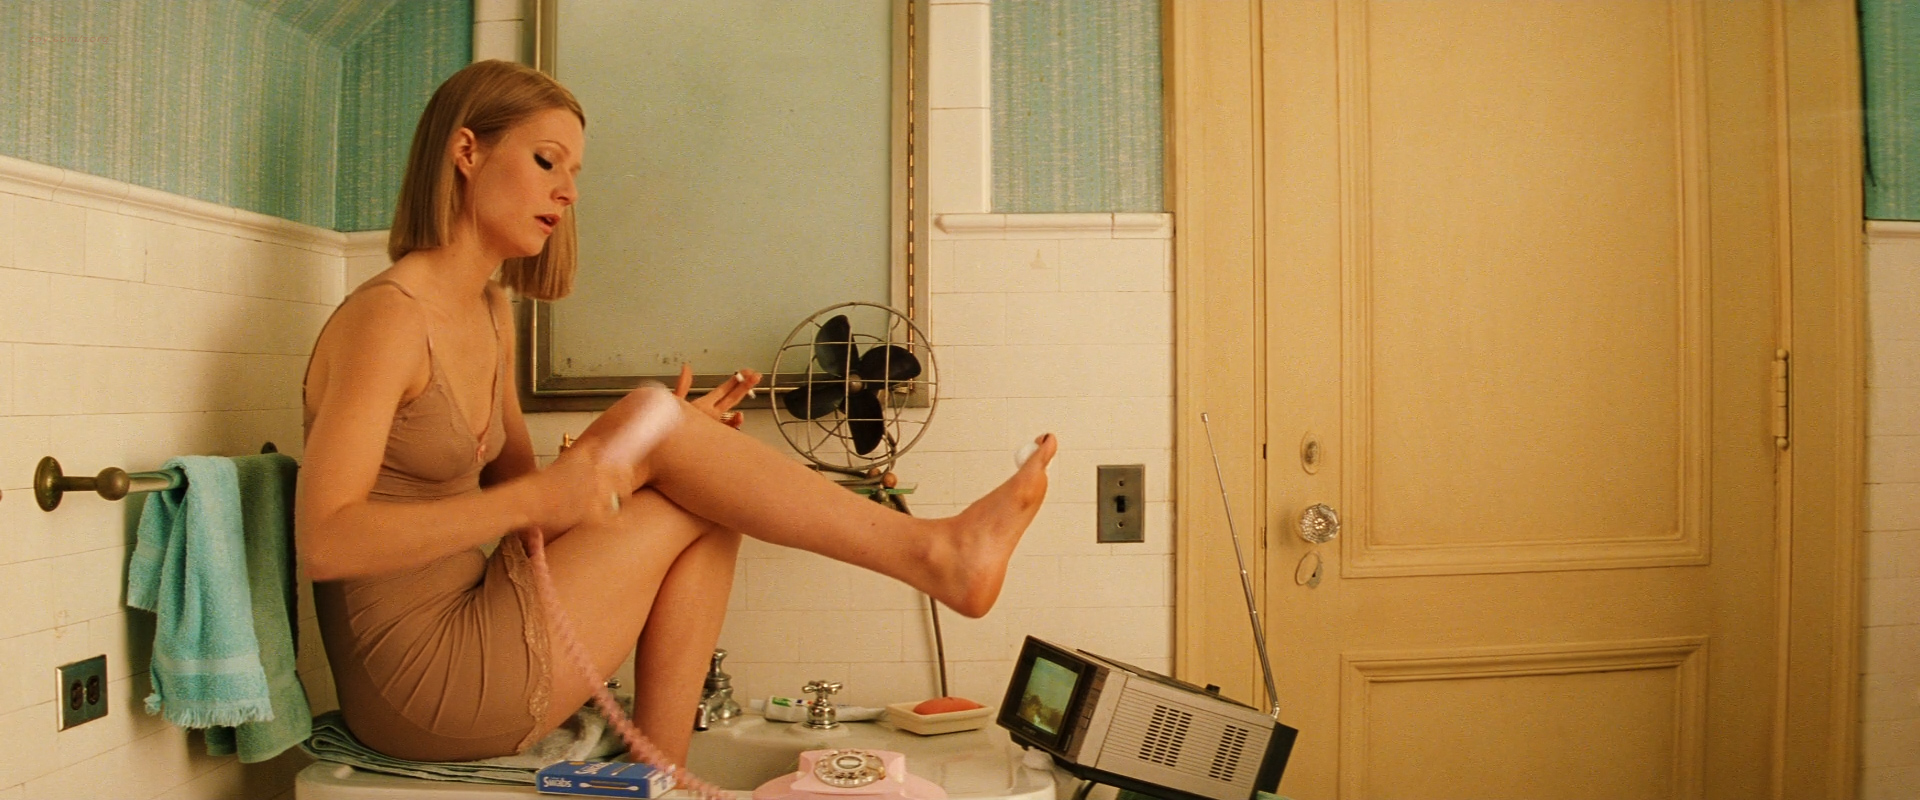 Gwyneth Paltrow sexy in lingerie - The Royal Tenenbaums (2001) hd720-1080p (6)